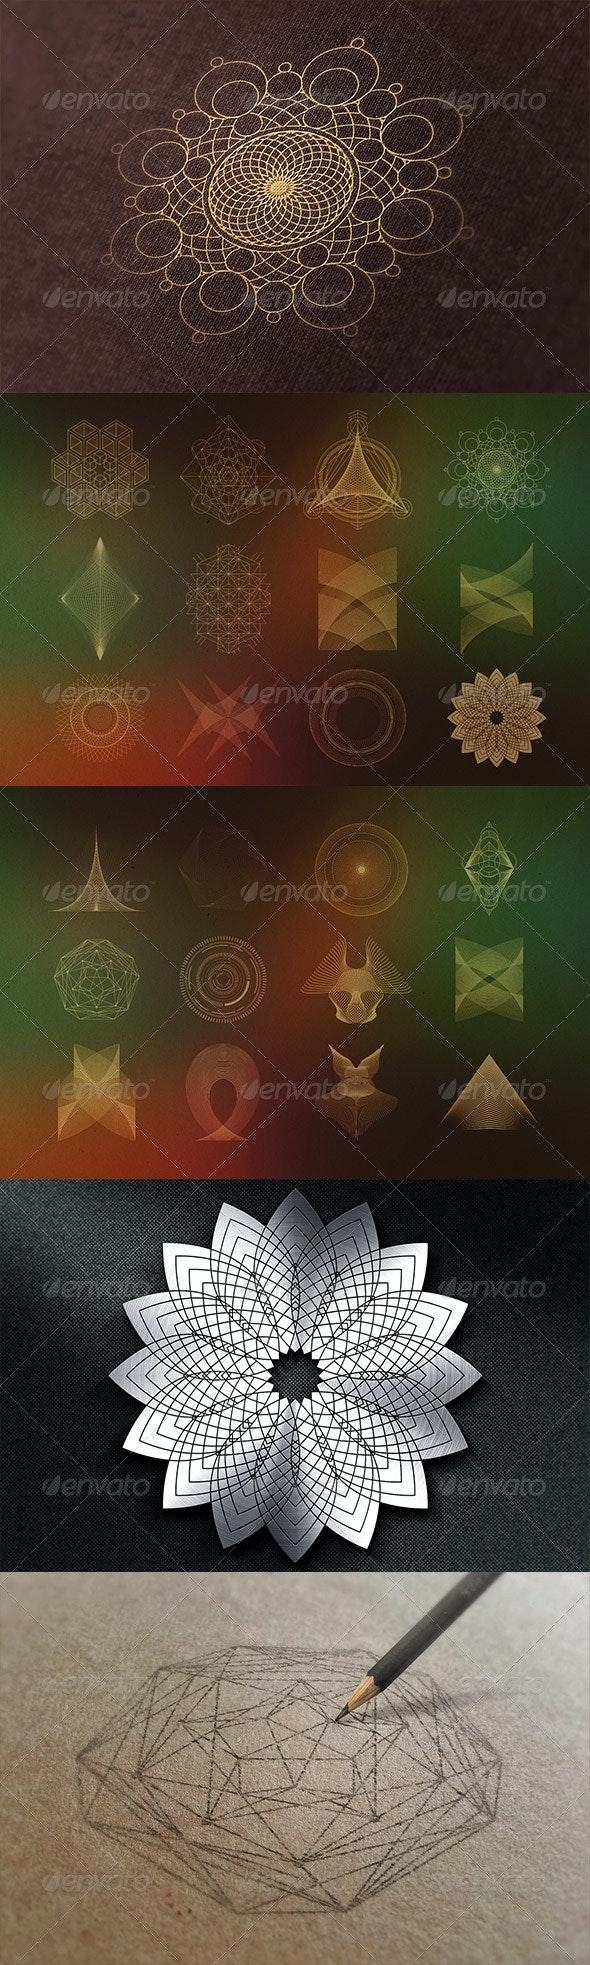 24 Geometric Shapes - Lines (v.2) - Decorative Symbols Decorative